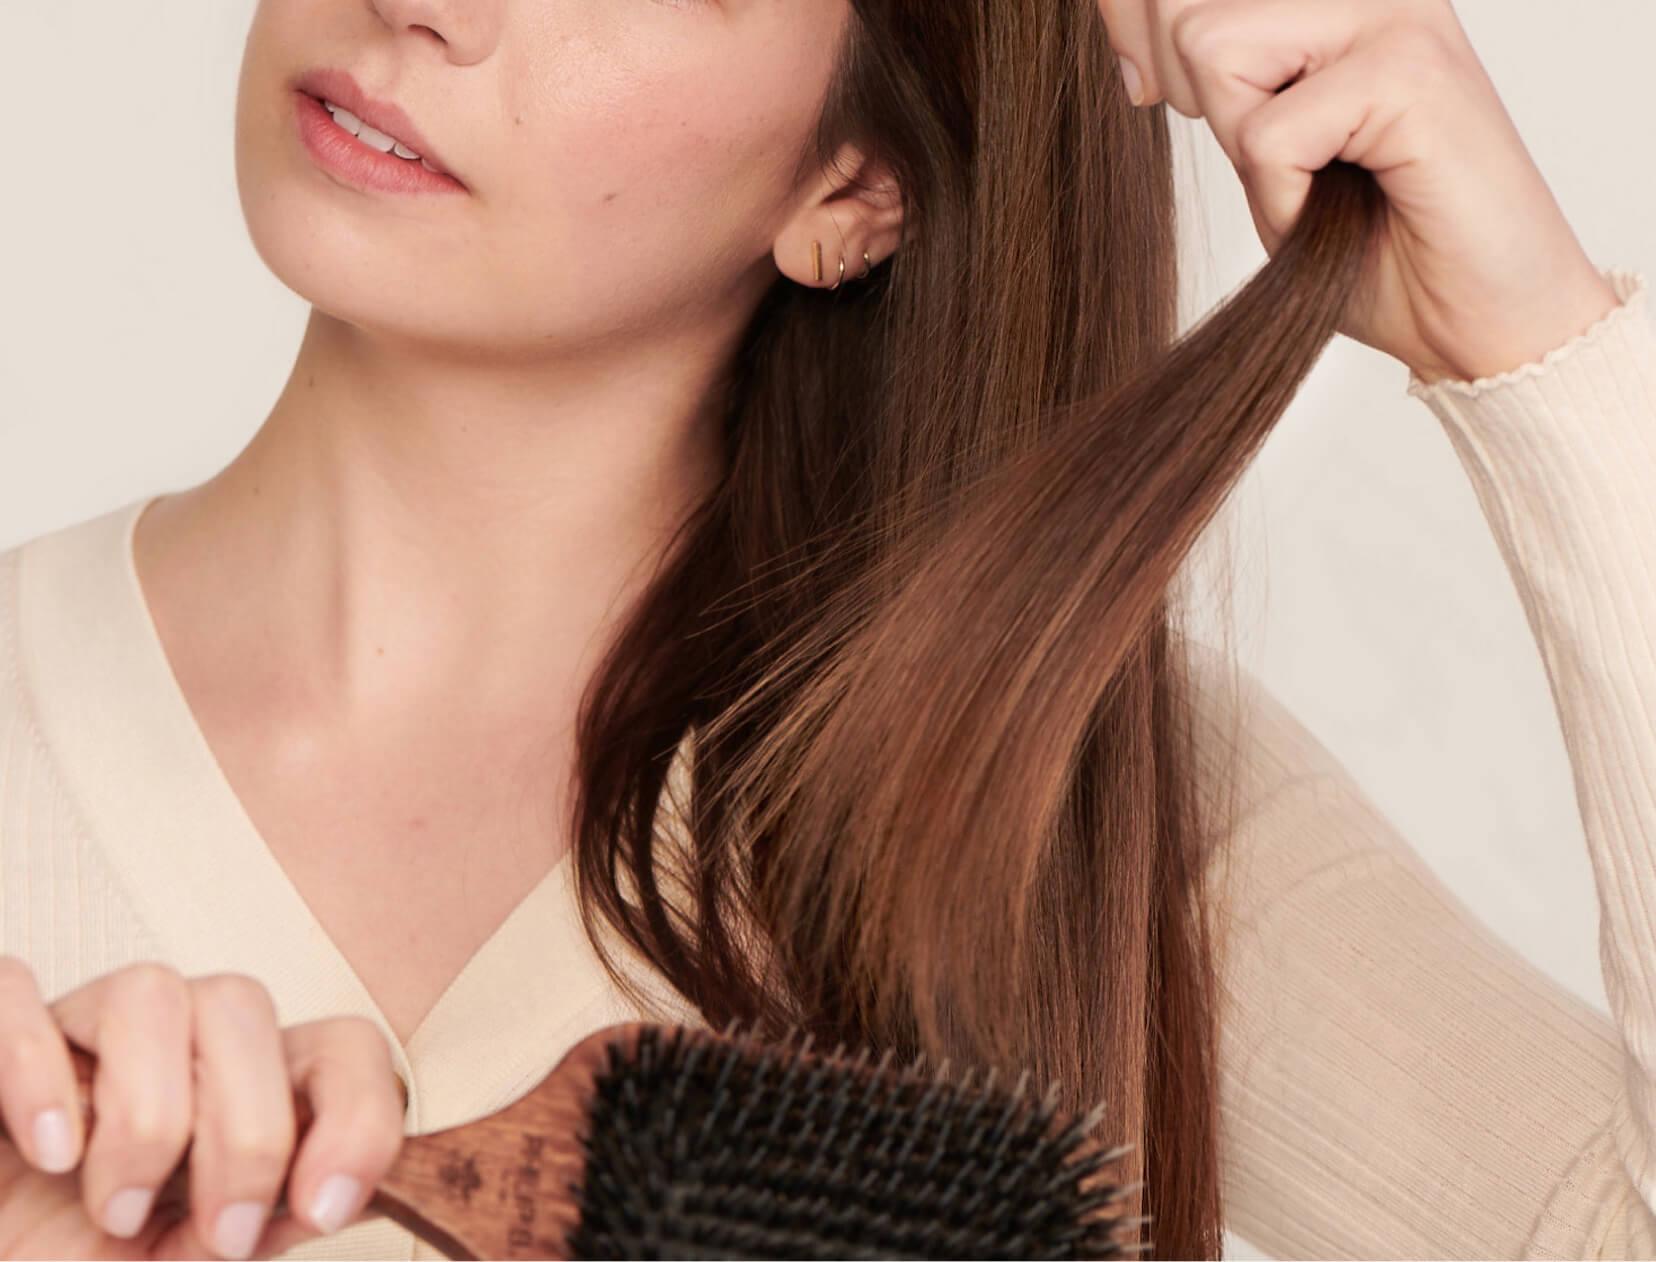 Woman brushin hair